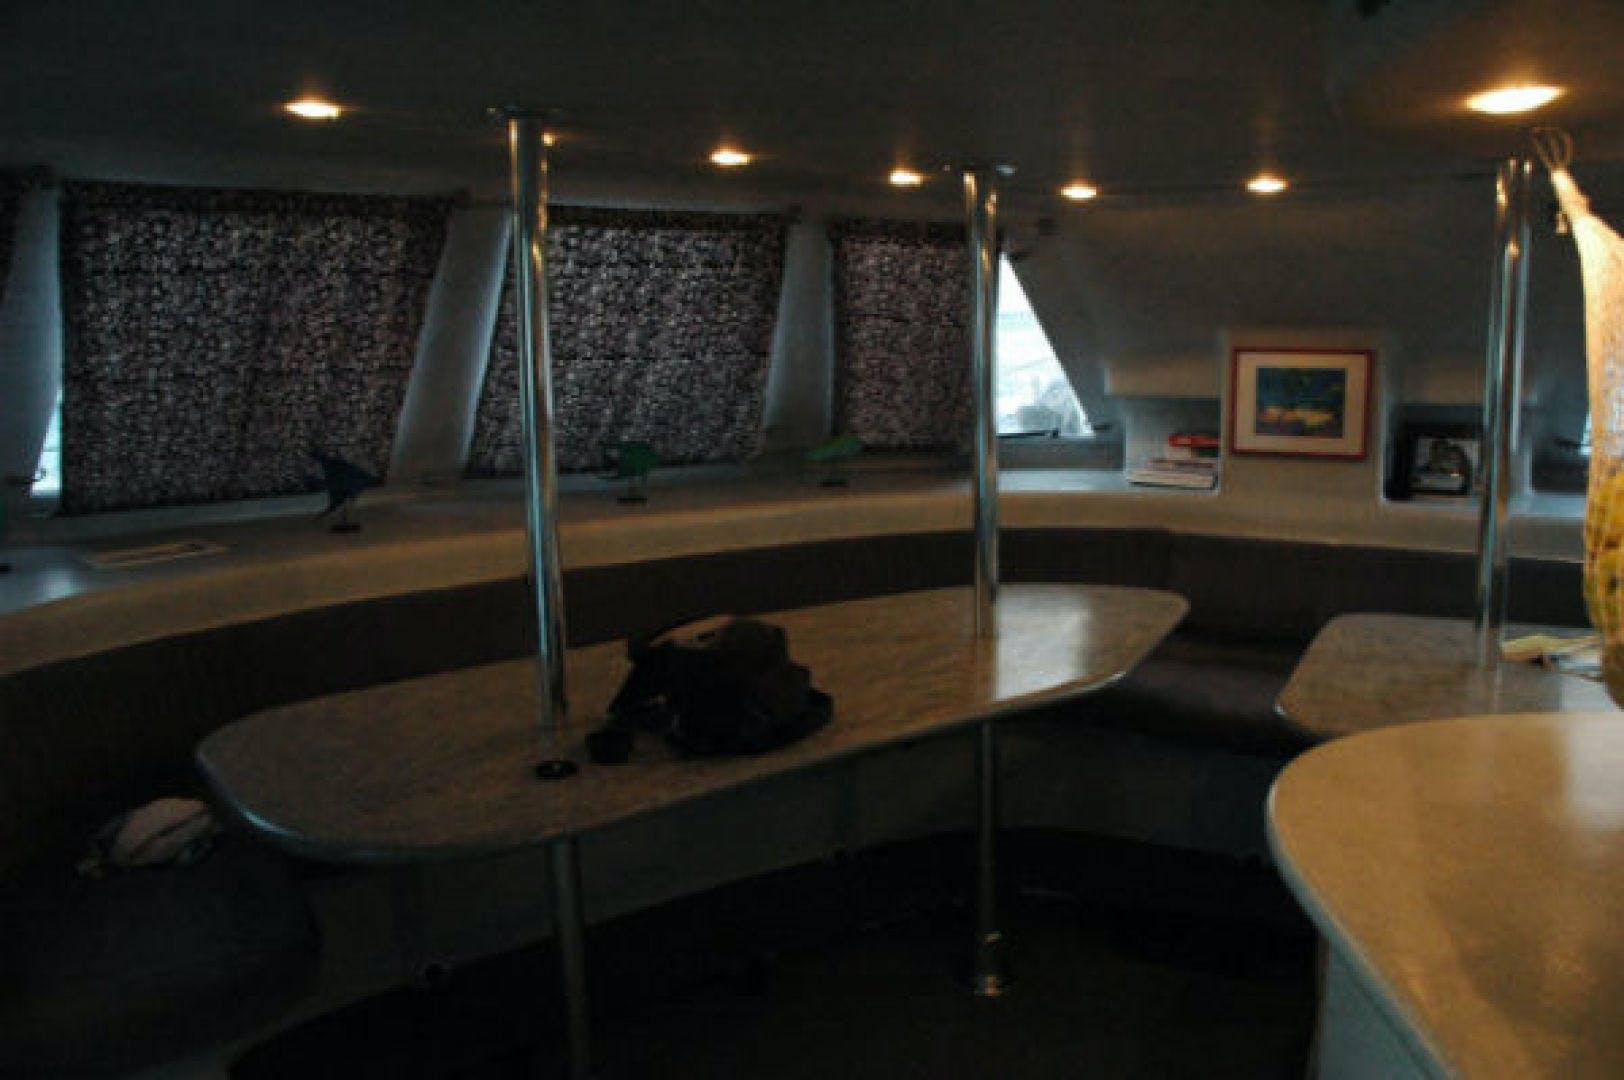 1999 Catamaran Custom Commercial Term Charter 60' Catamaran 60 No Name | Picture 6 of 16